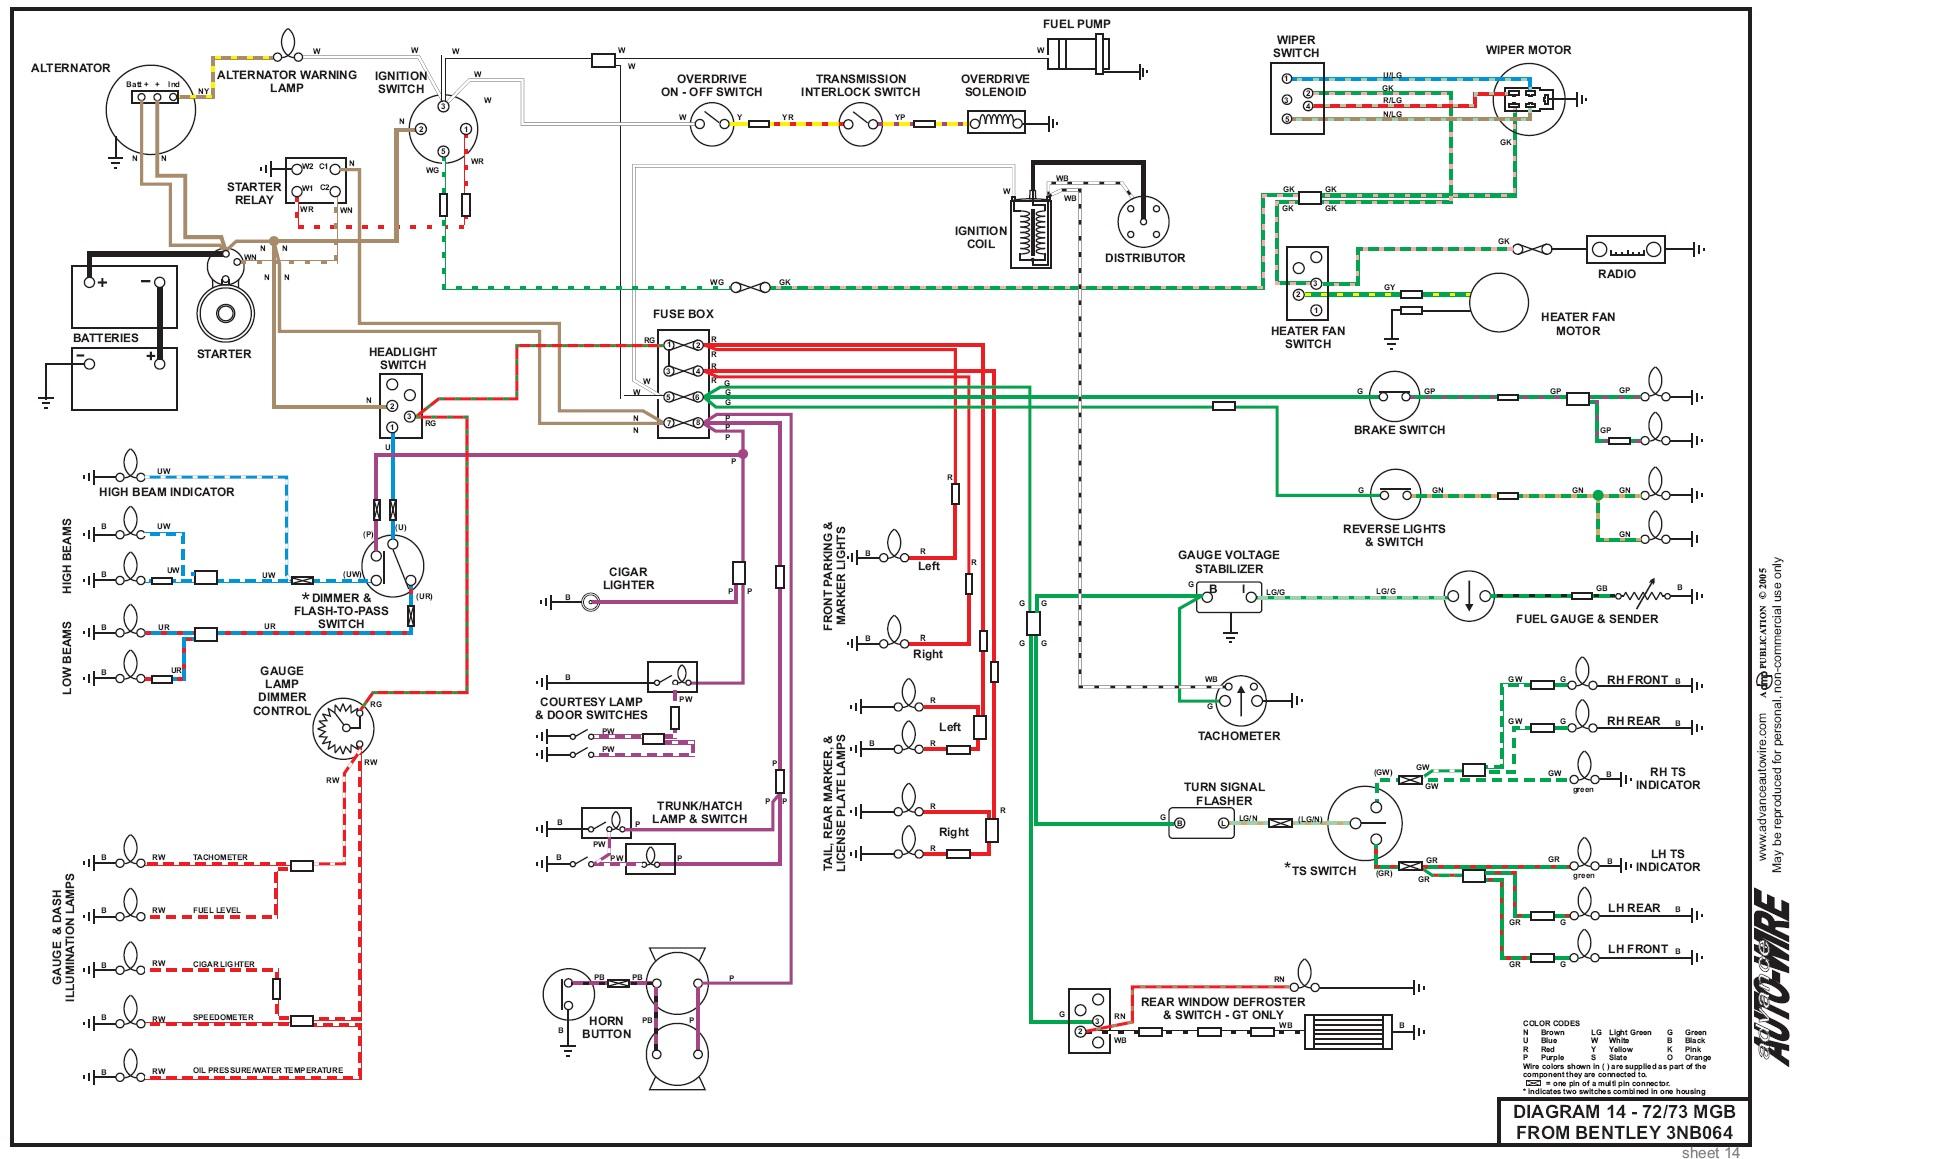 1972 mgb wiring harness diagrams schematic wiring diagram Turn Signal Relay Wiring Diagram